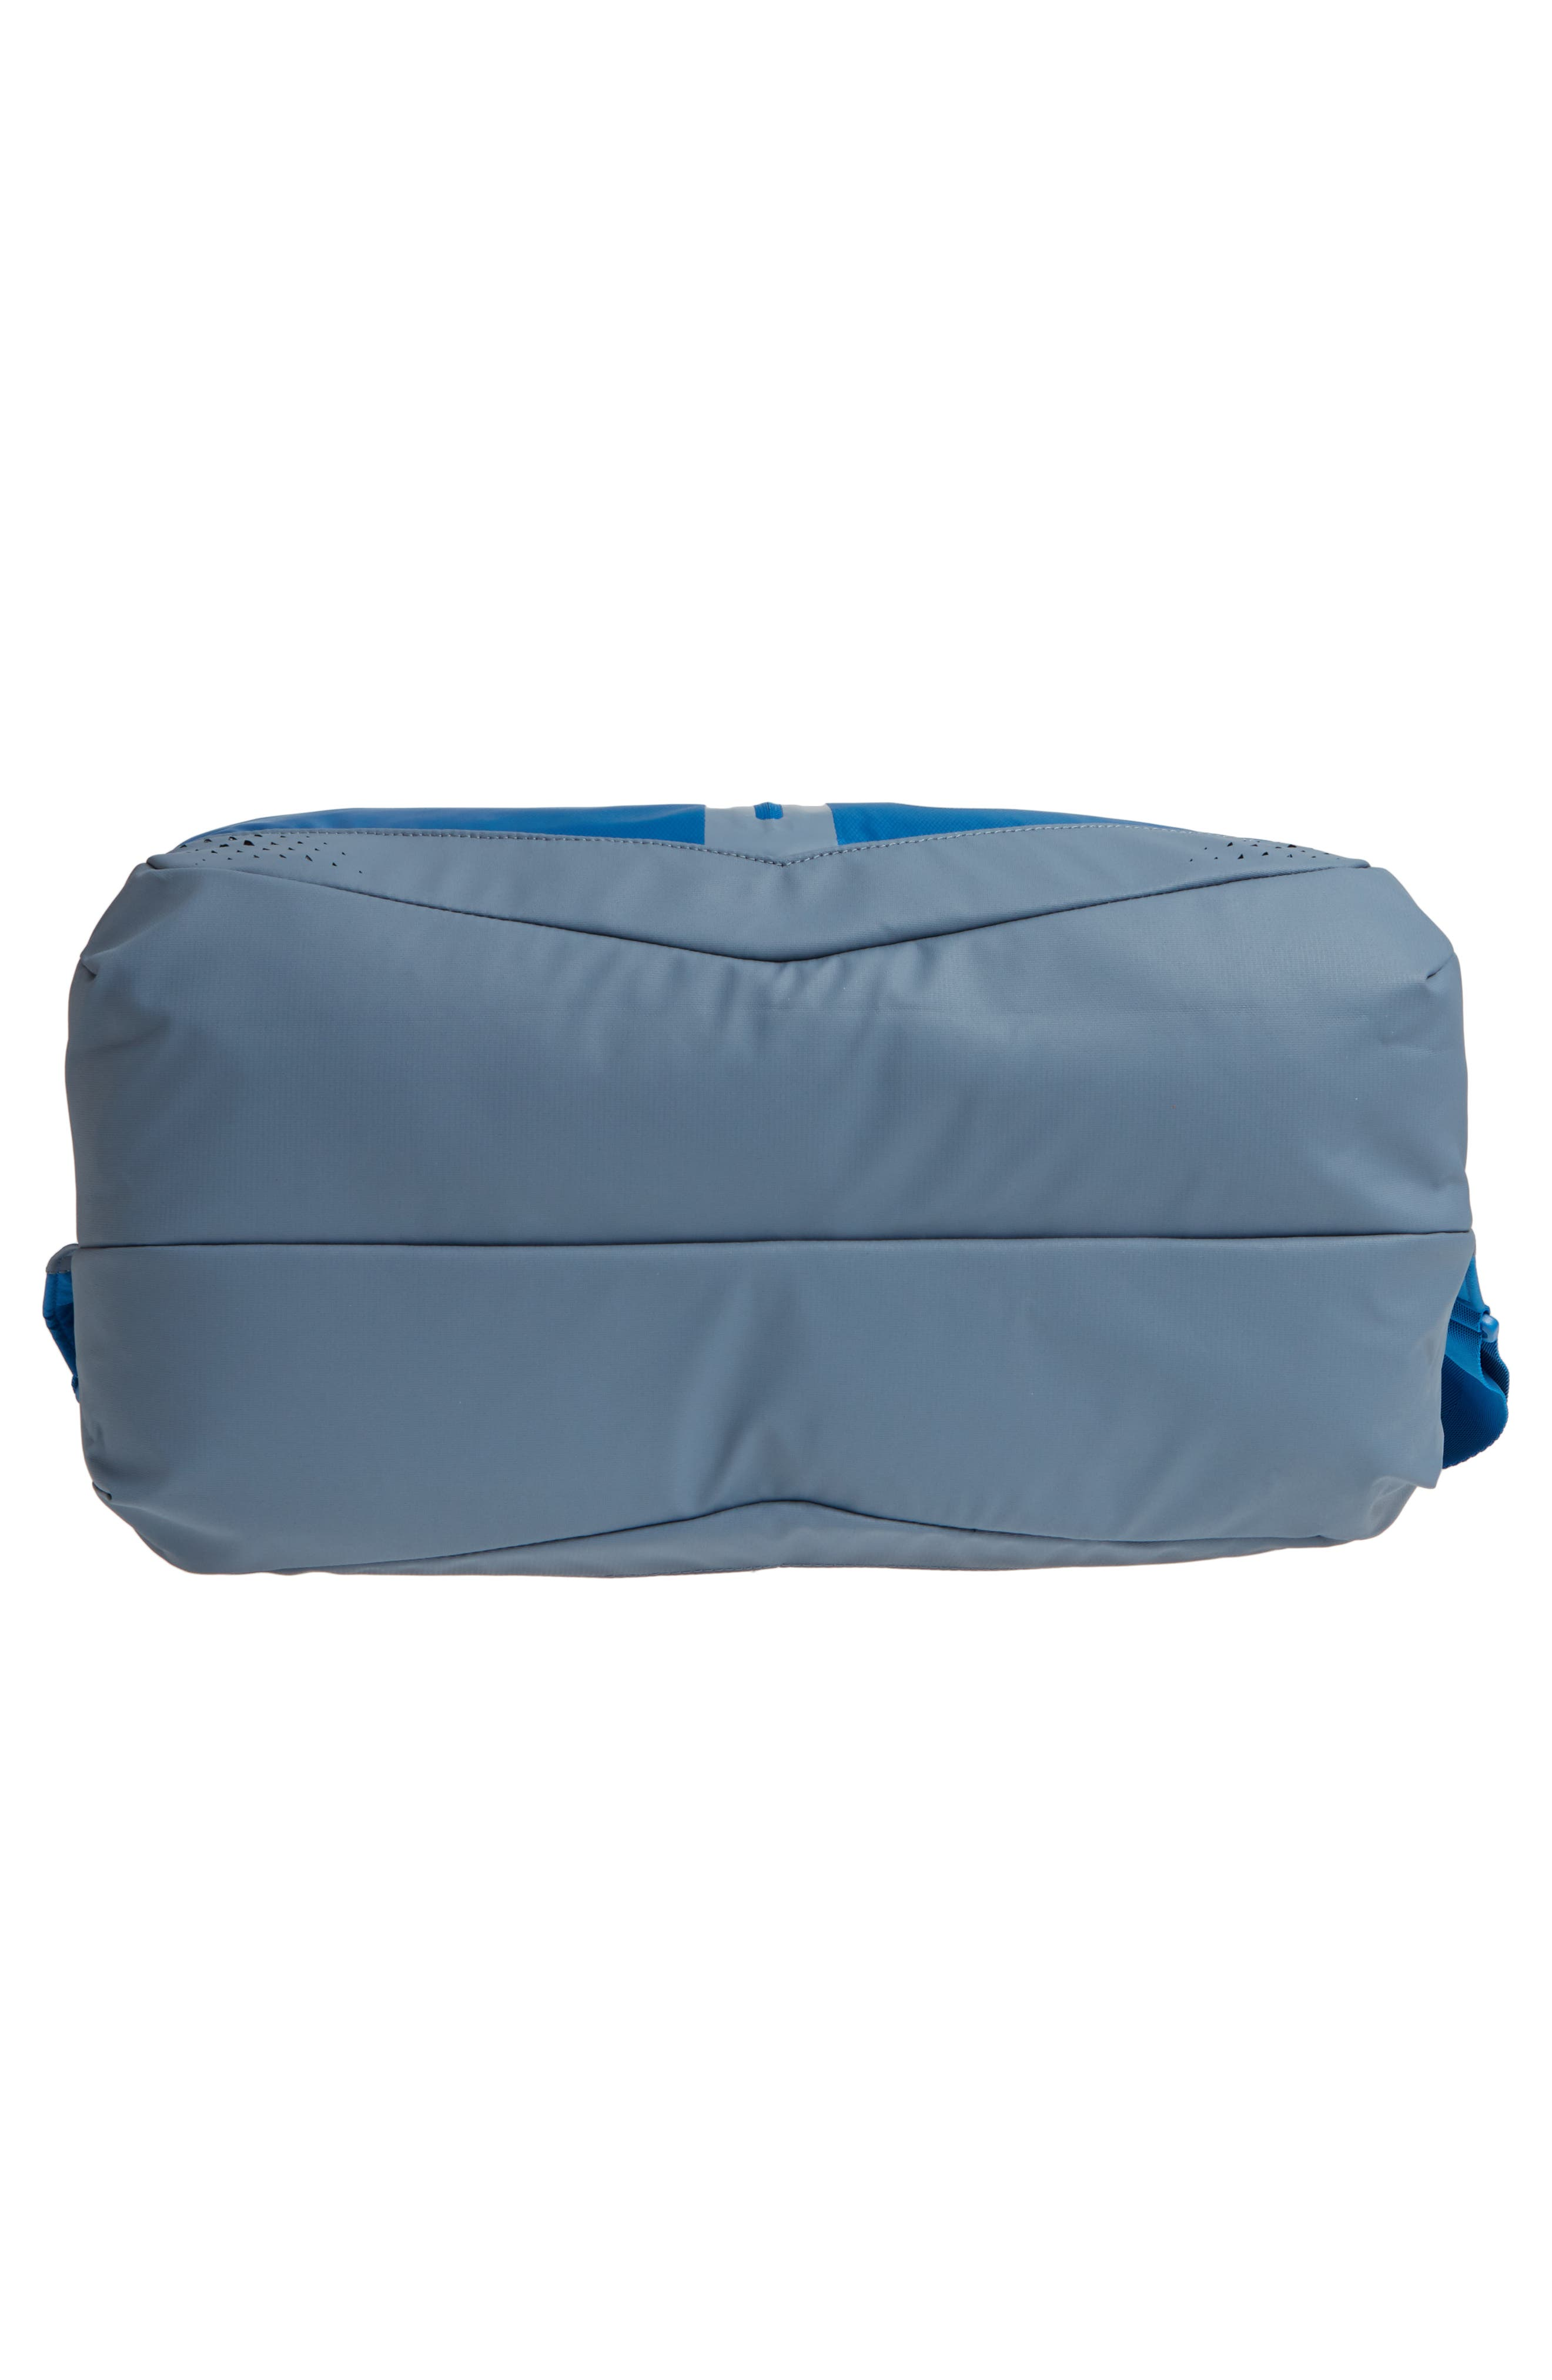 Run Duffel Bag,                             Alternate thumbnail 6, color,                             Blue Jay/ Armory Blue/ Silver